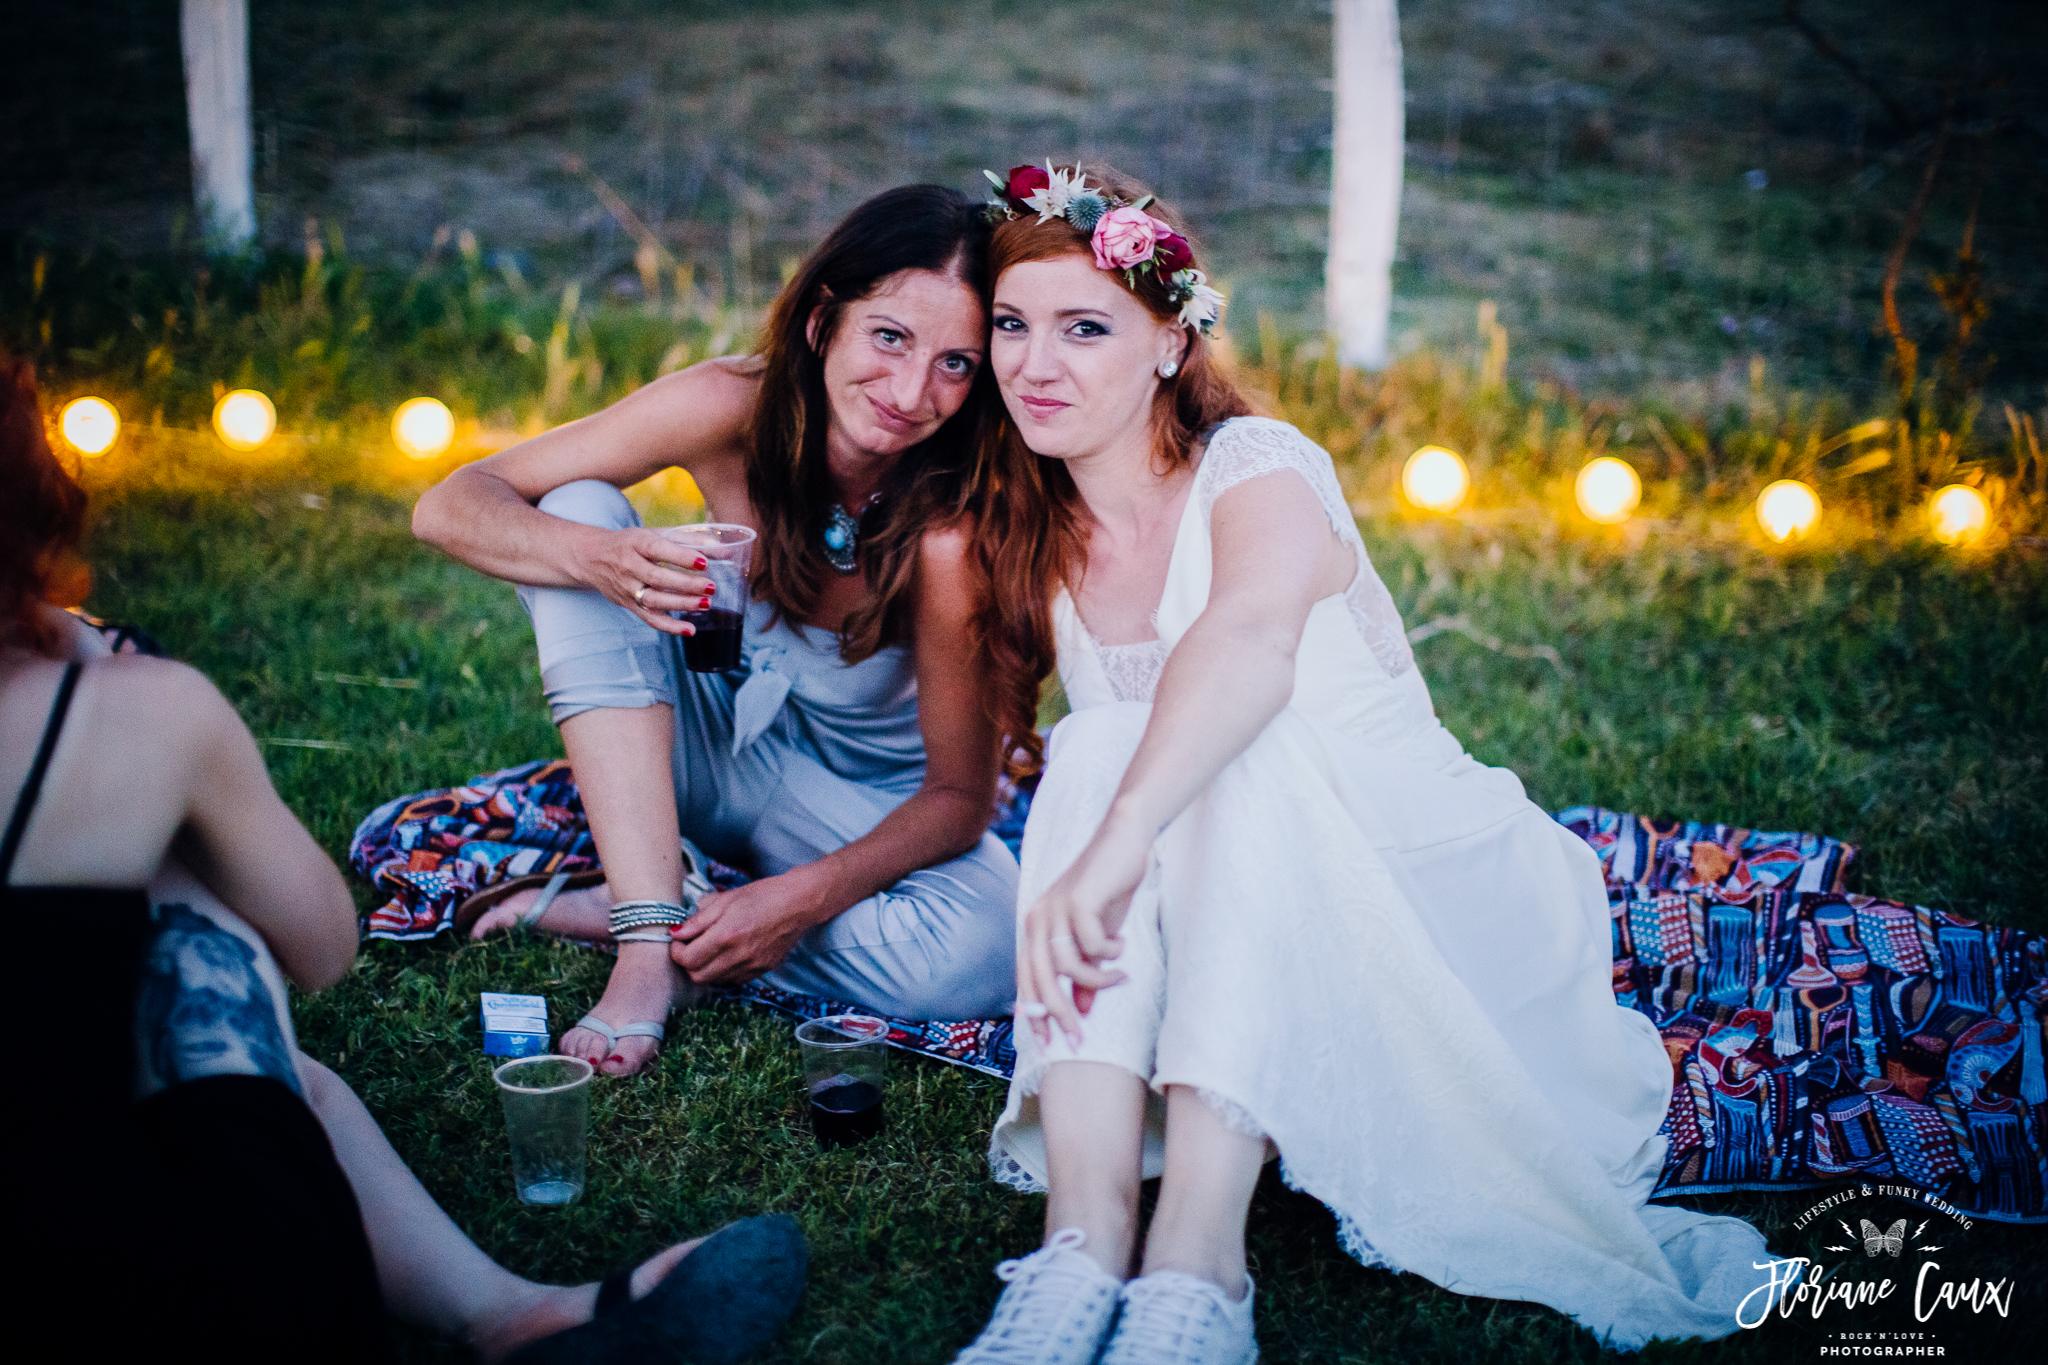 photographe-mariage-toulouse-rocknroll-maries-tatoues-floriane-caux-119